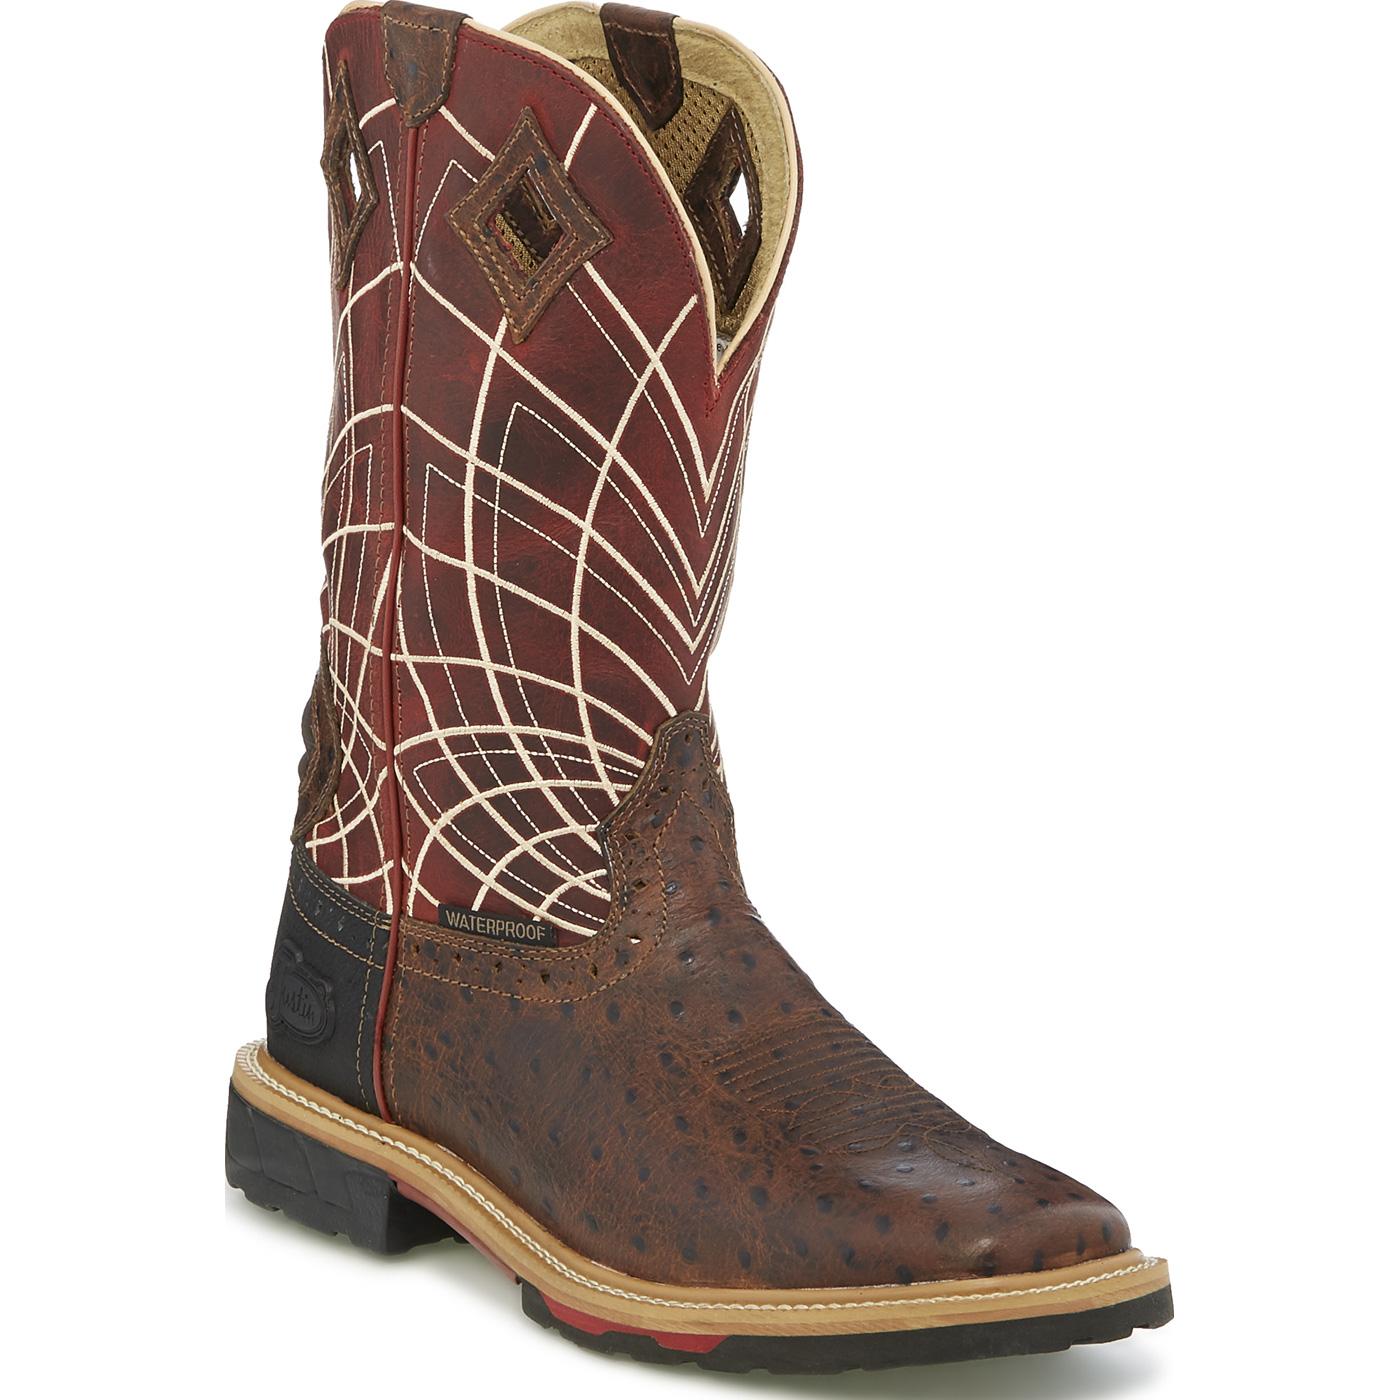 0982e01856c Justin Work Hybred® Derrickman Ostrich Print Men's Composite Toe Electrical  Hazard Waterproof Pull-on Work Boots